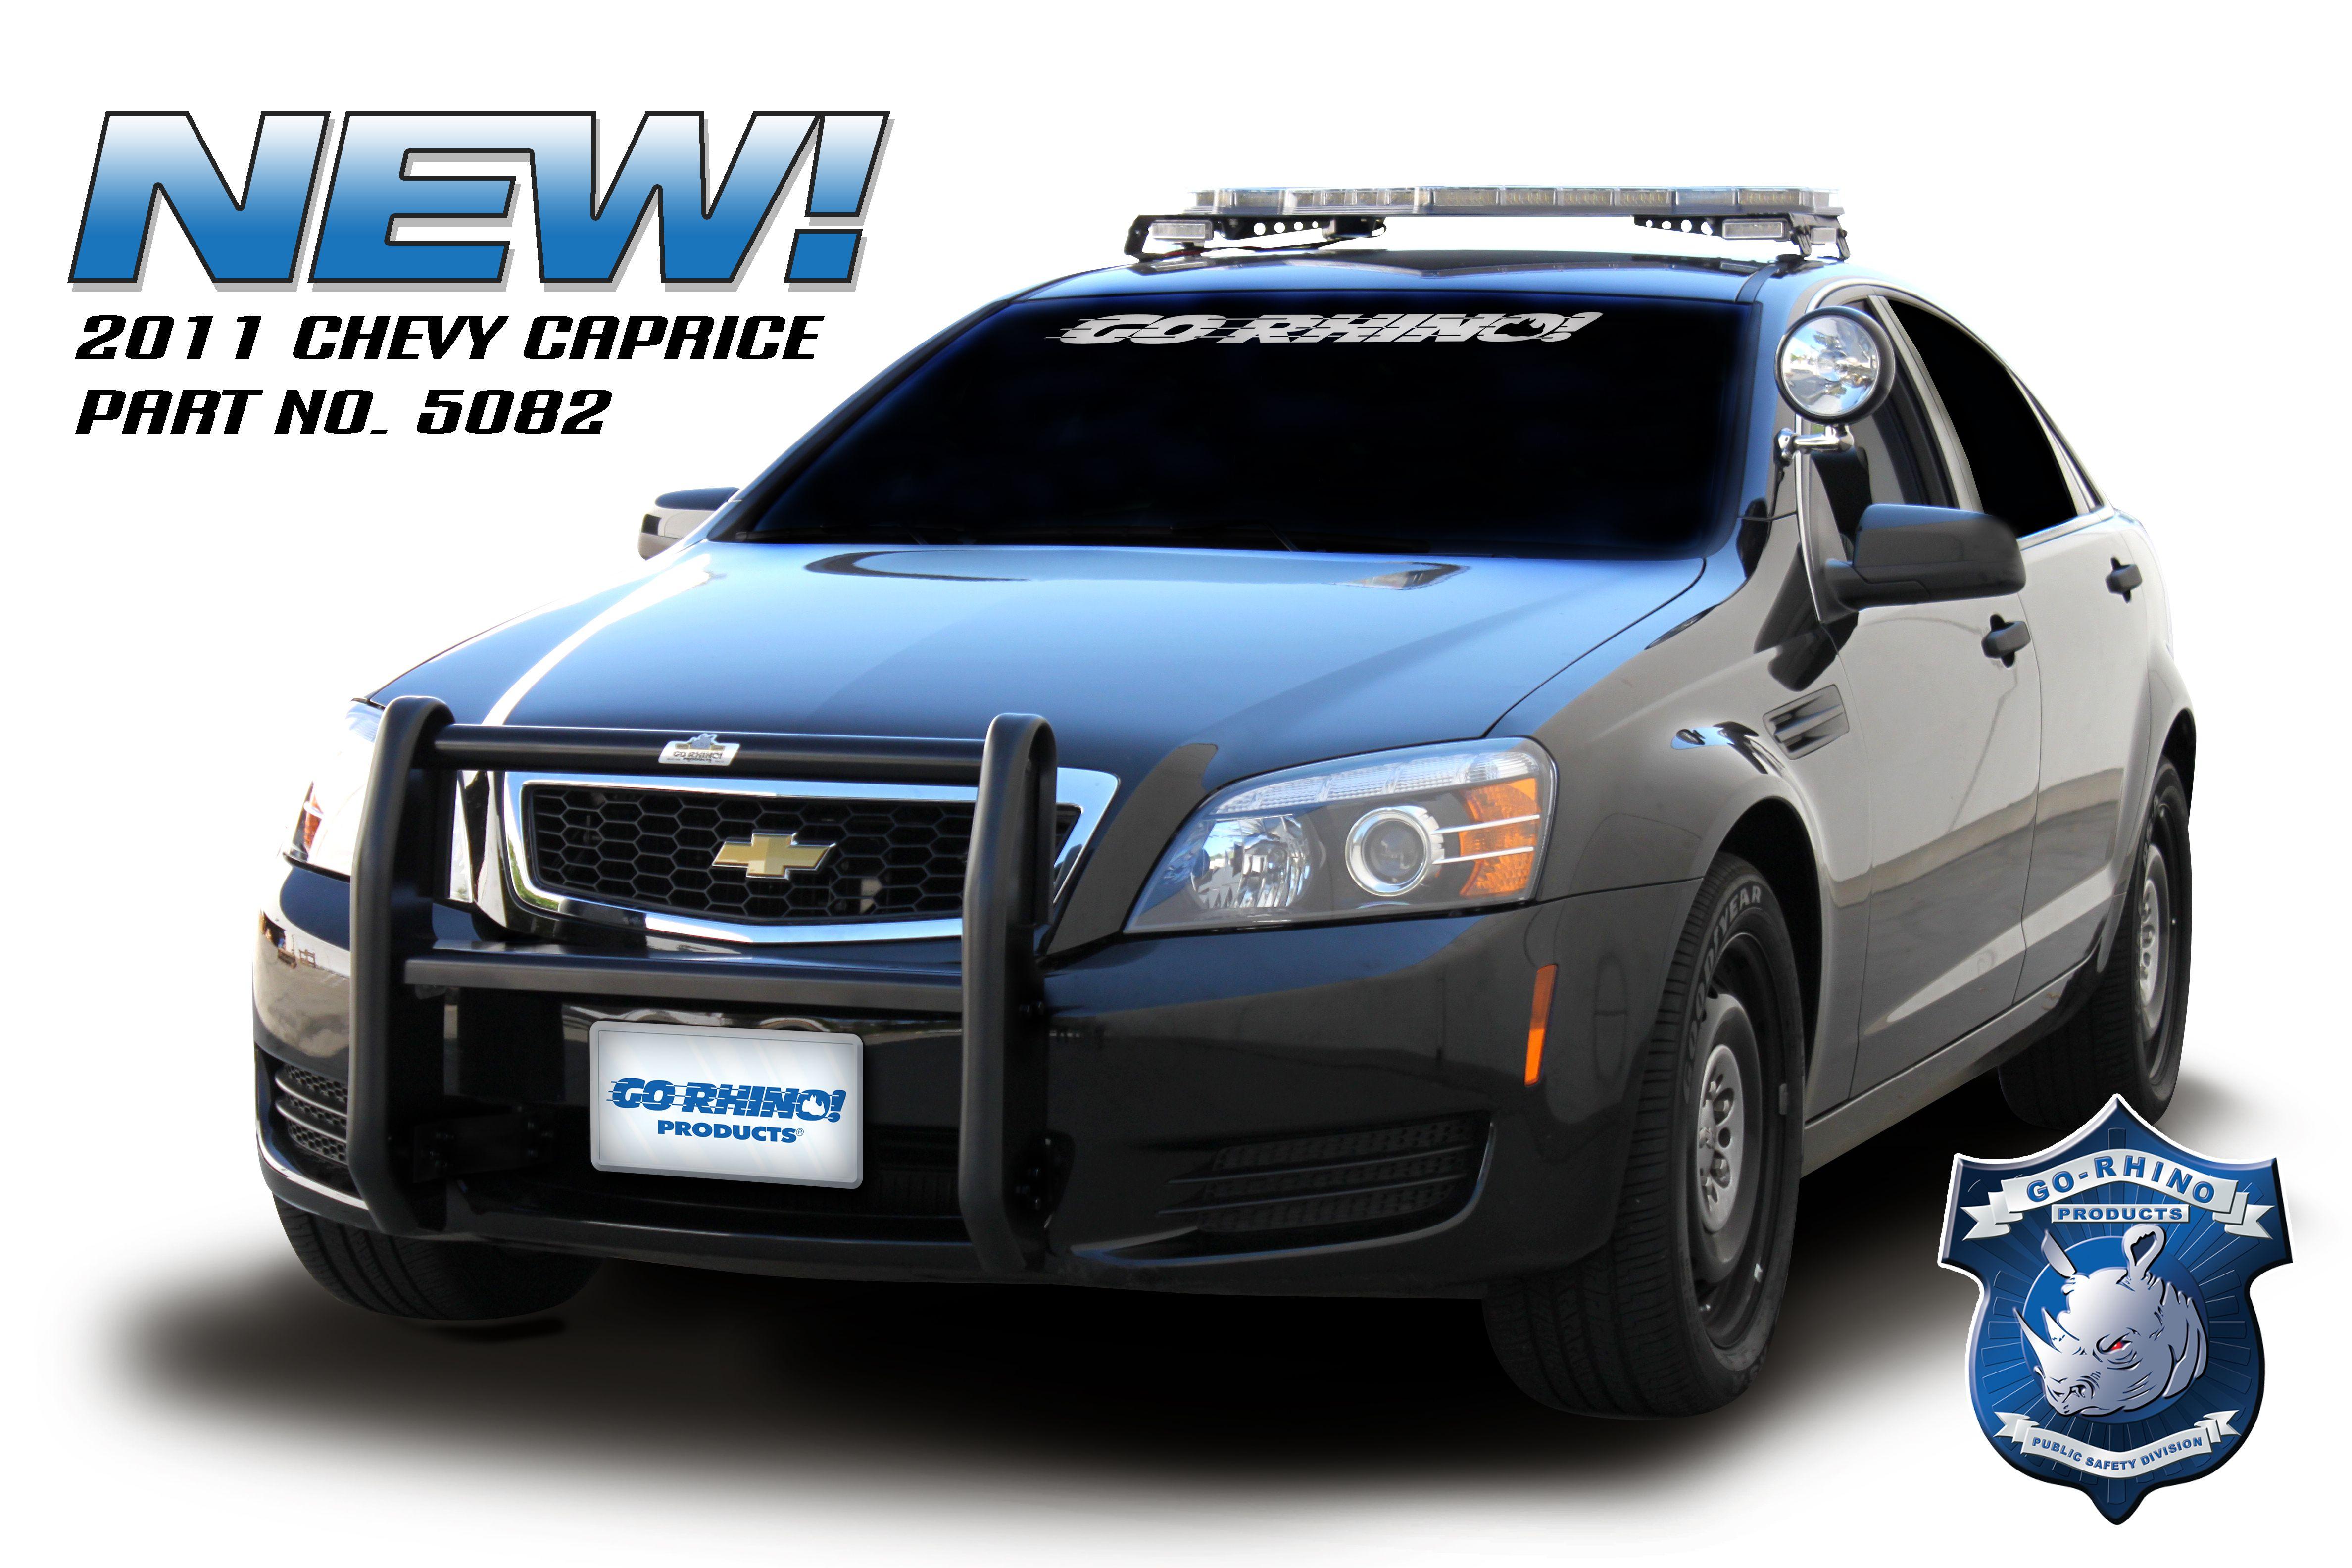 Chevrolet Caprice PPV Push Bumper